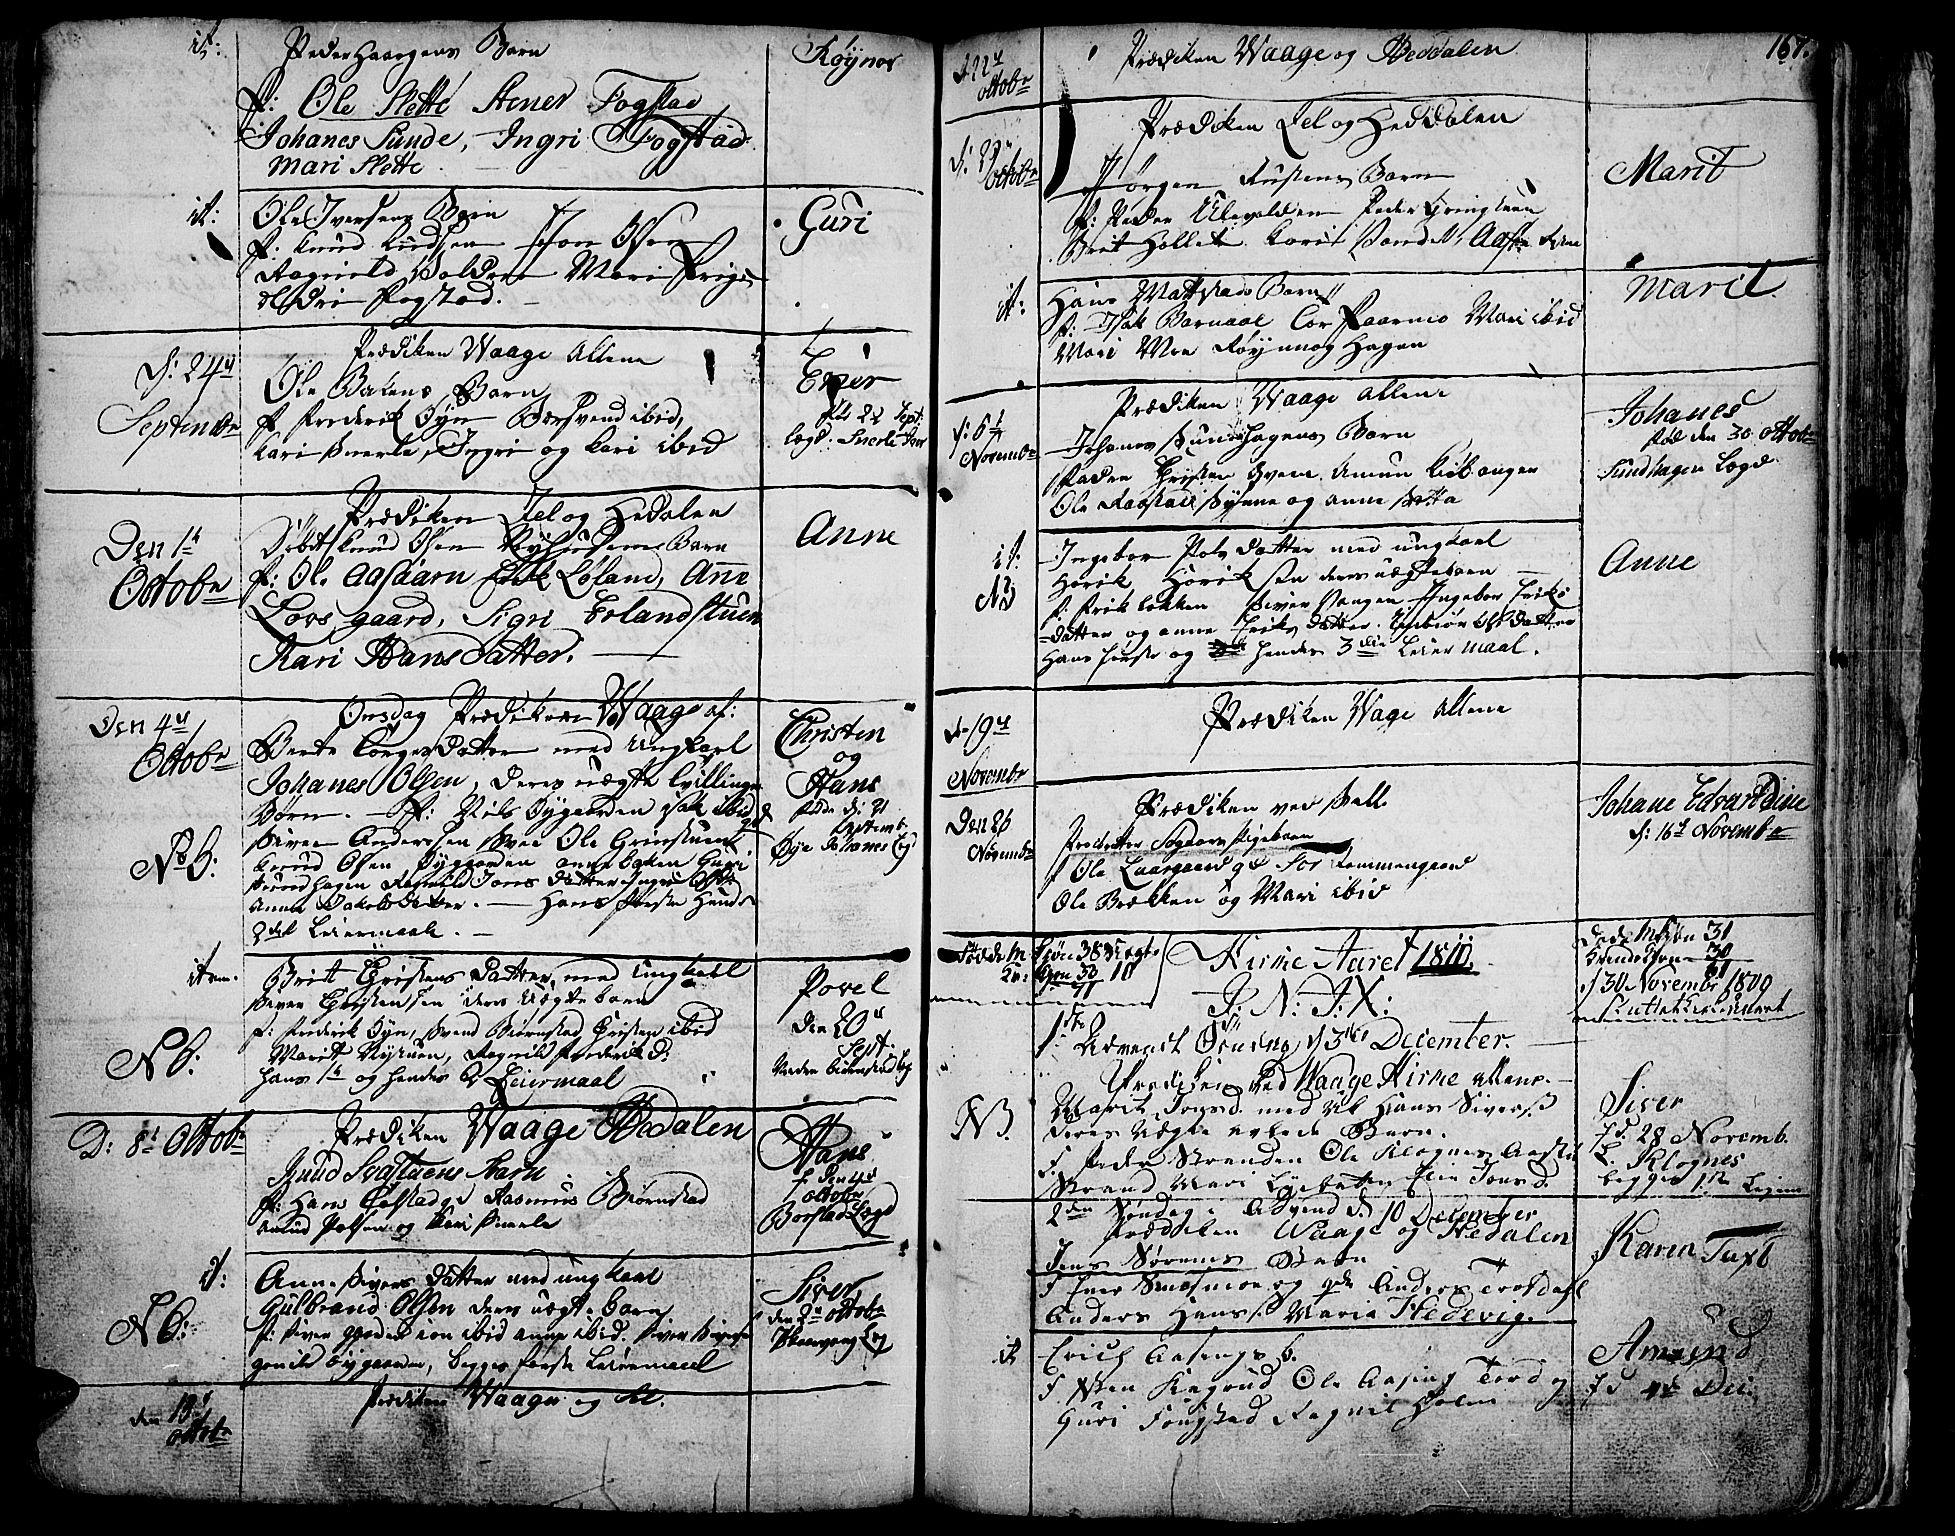 SAH, Vågå prestekontor, Ministerialbok nr. 1, 1739-1810, s. 167